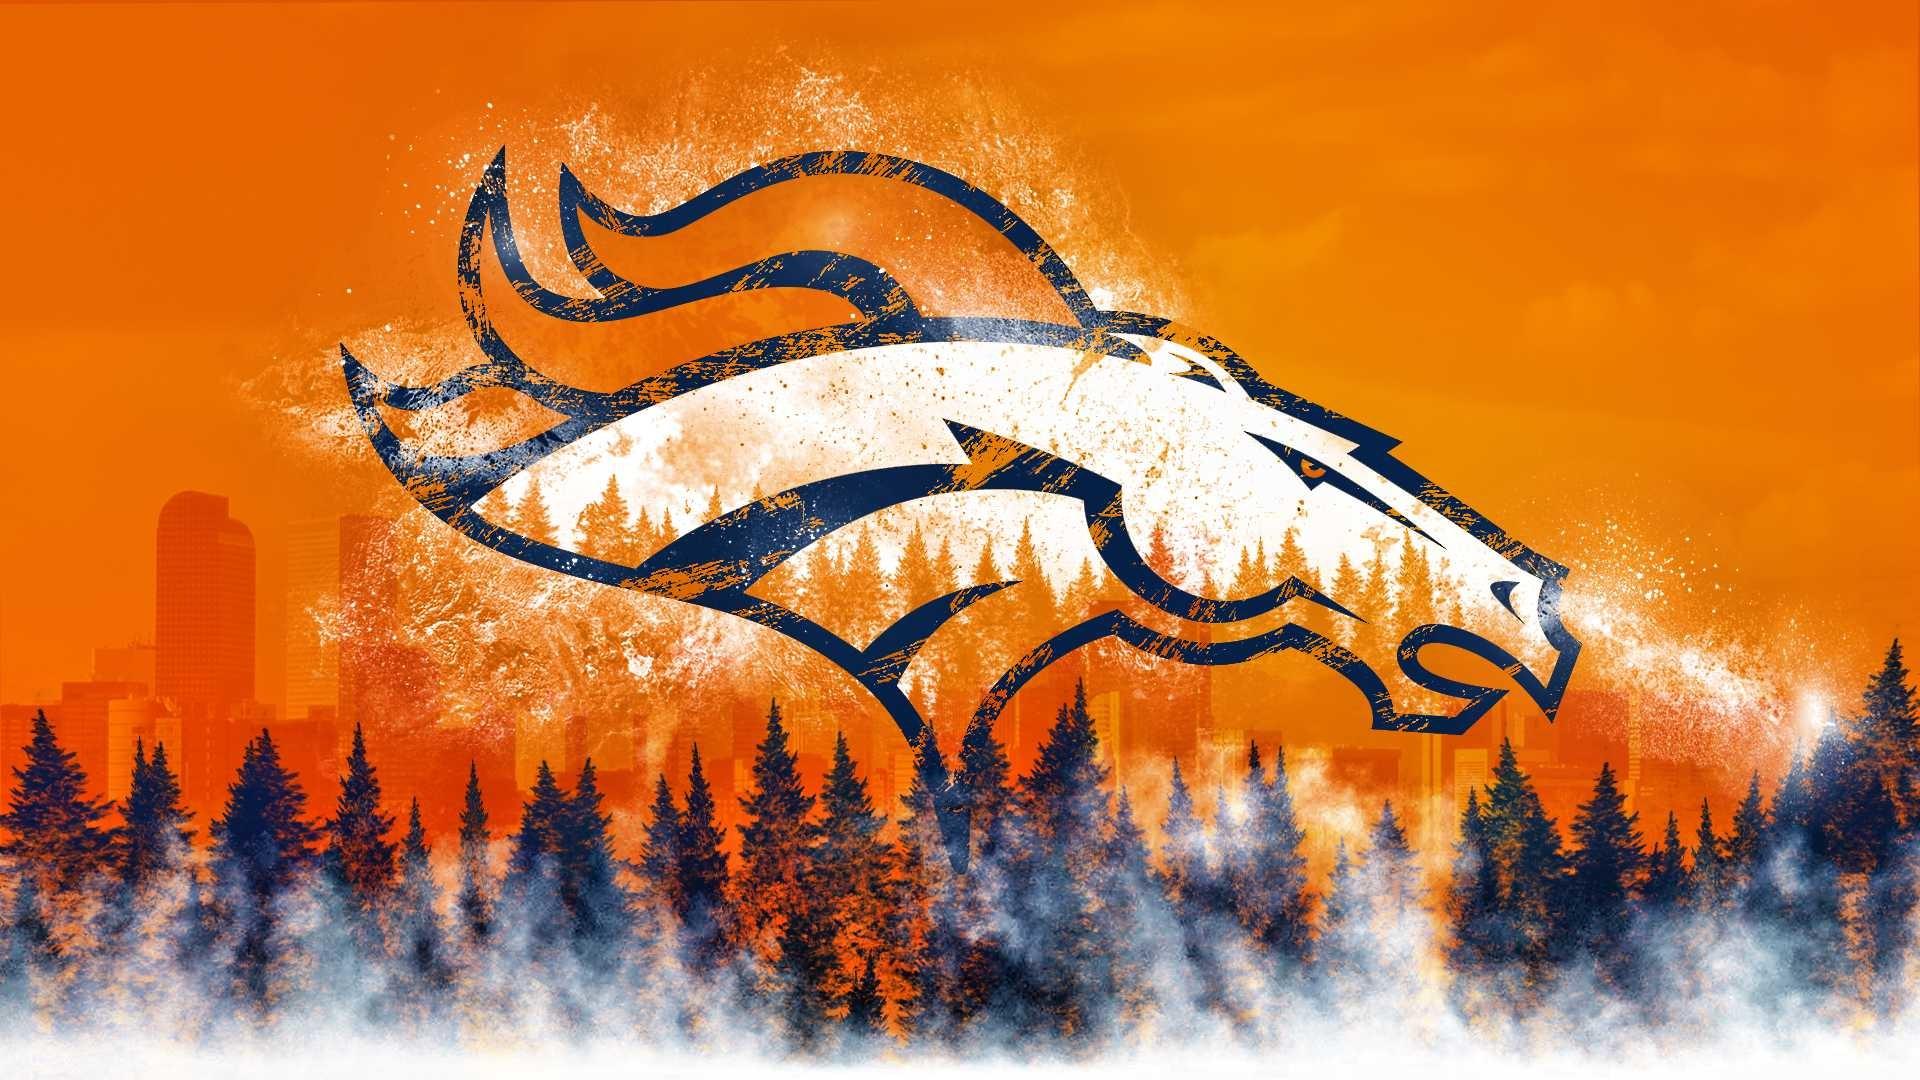 Res: 1920x1080, Denver Broncos Wallpaper Px Full Hd Of Mobile Pics